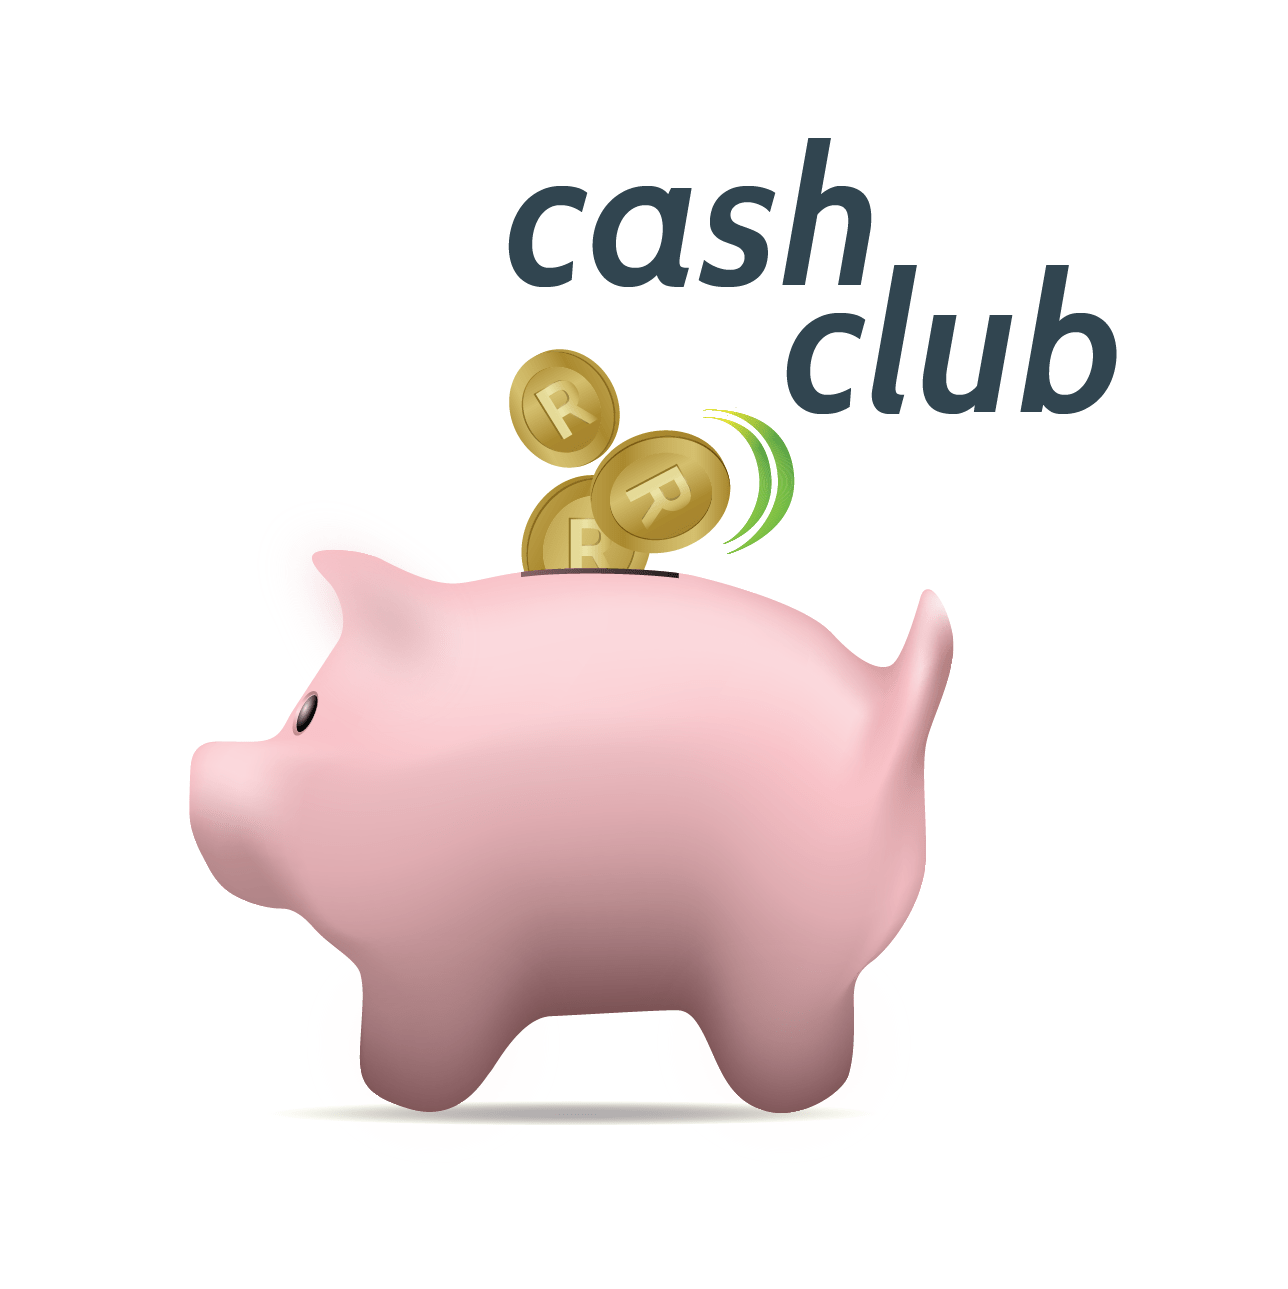 Cash Club: 2020 – The upside